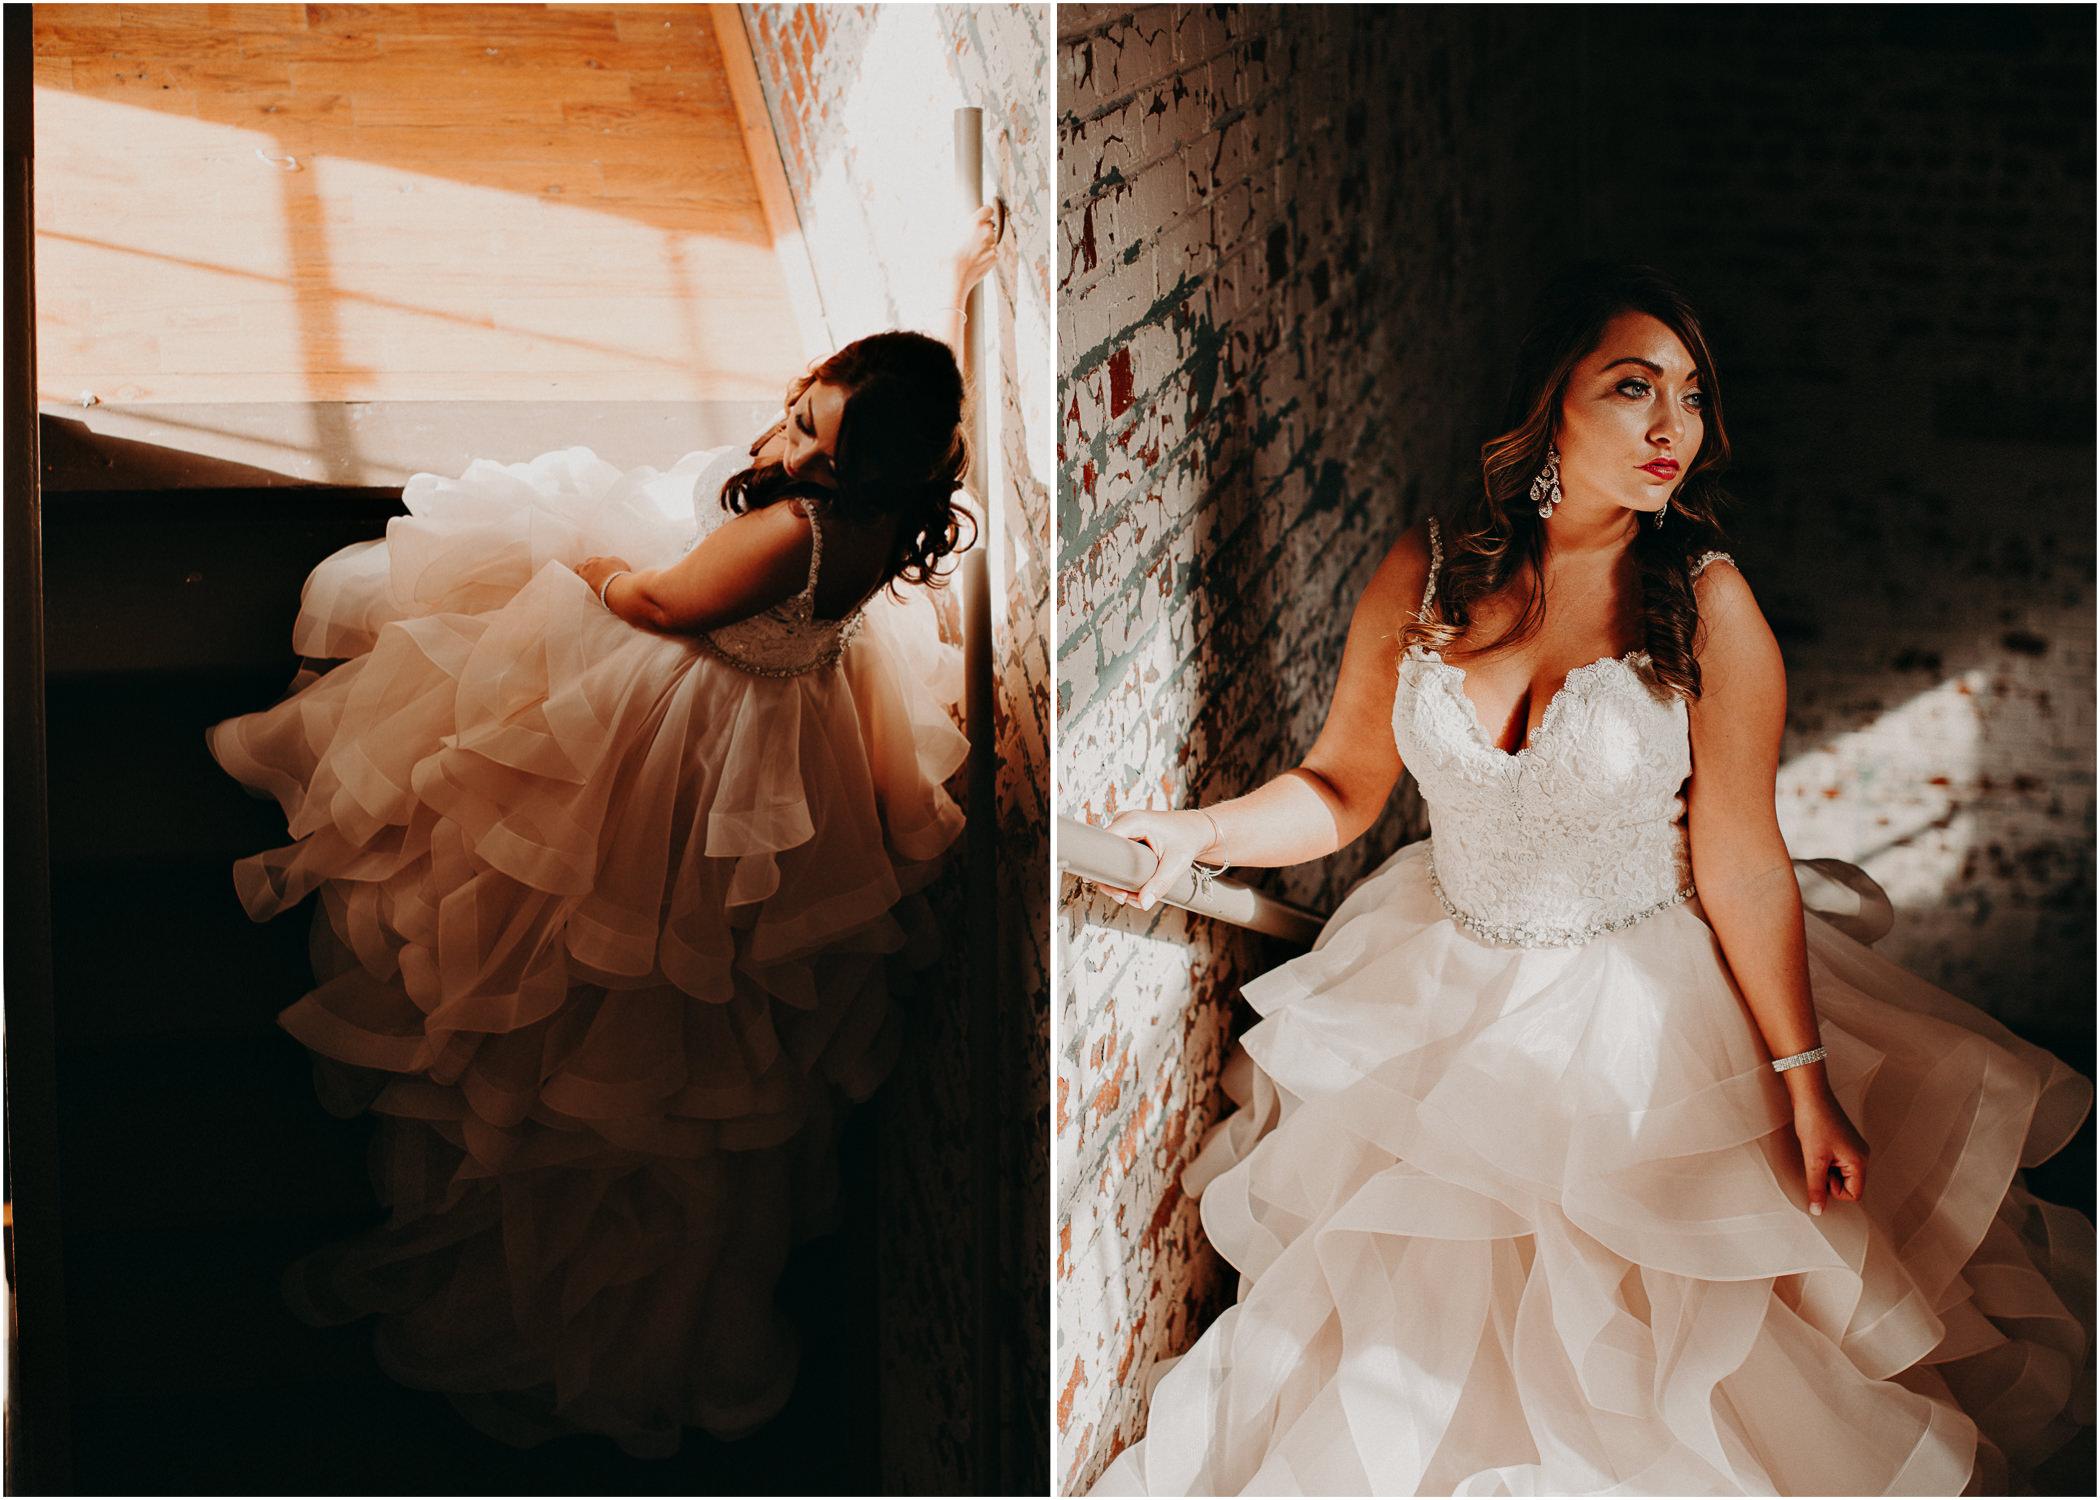 34 4 - Atlanta Wedding Photographer - The engine room - Ga - Wedding trends - Aline Marin Photography.jpg